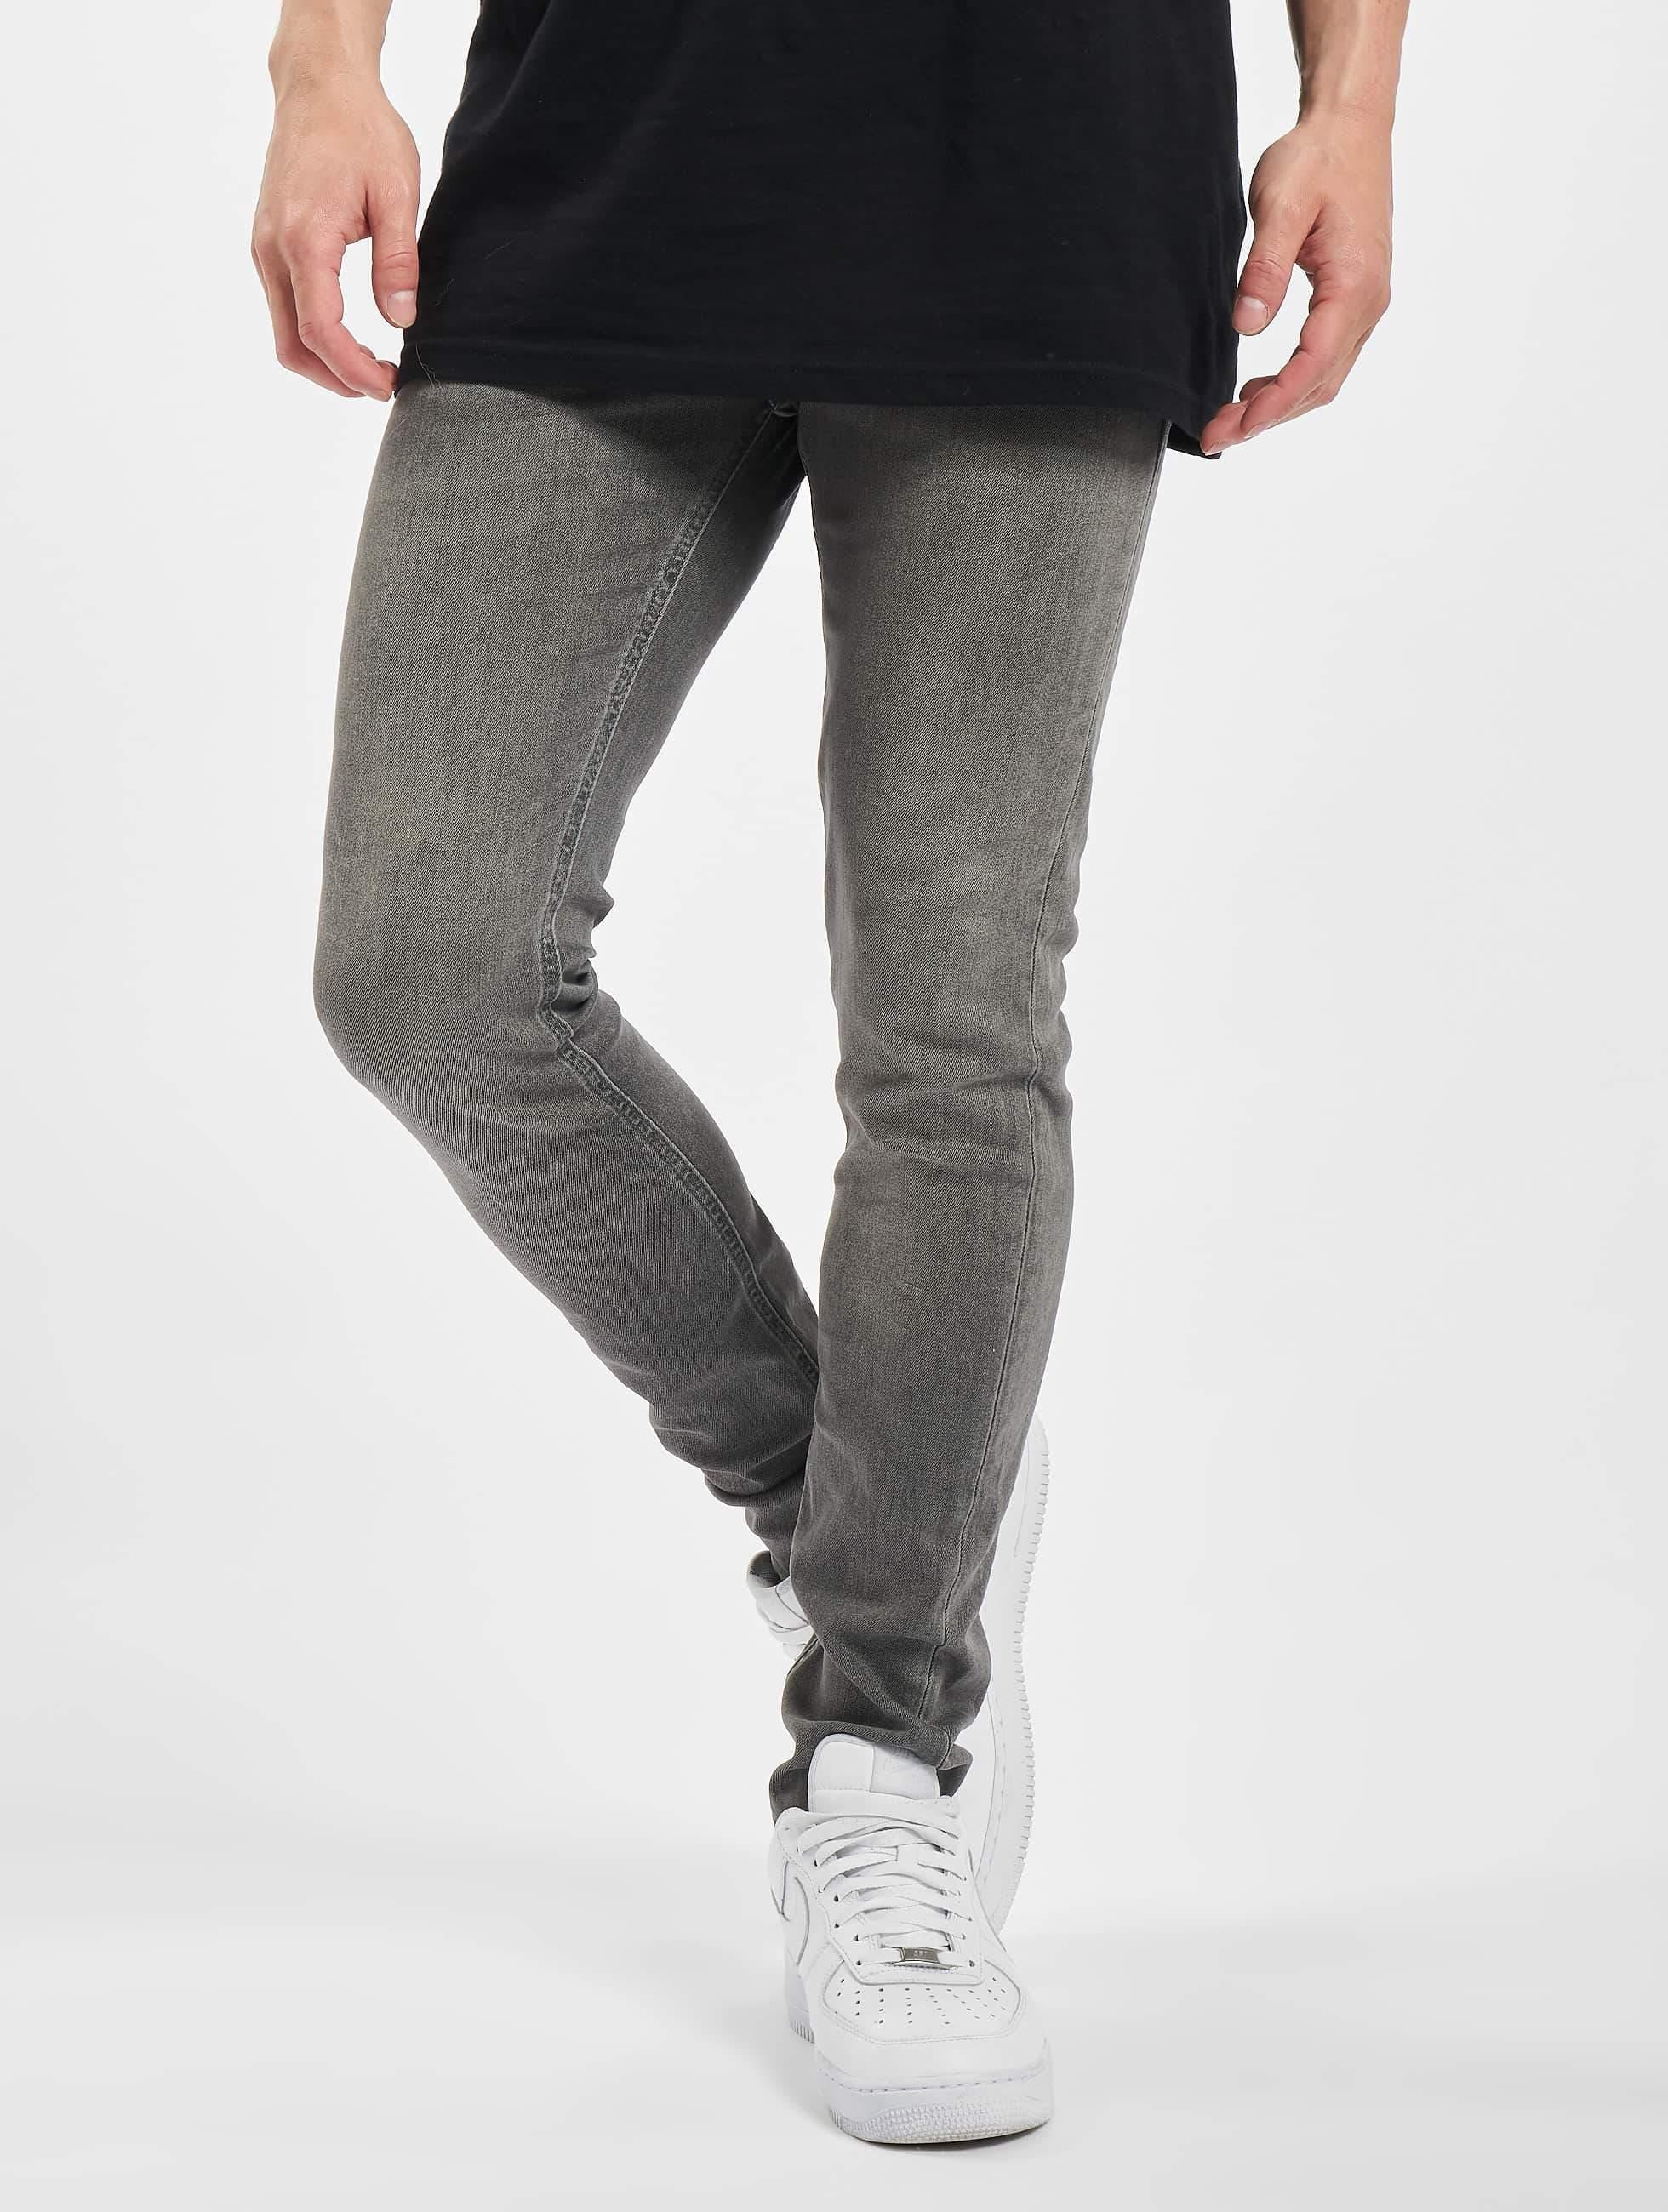 on sale 0950b 15350 Jack & Jones jjiLiam jjOriginal Skinny Jeans Grey Denim